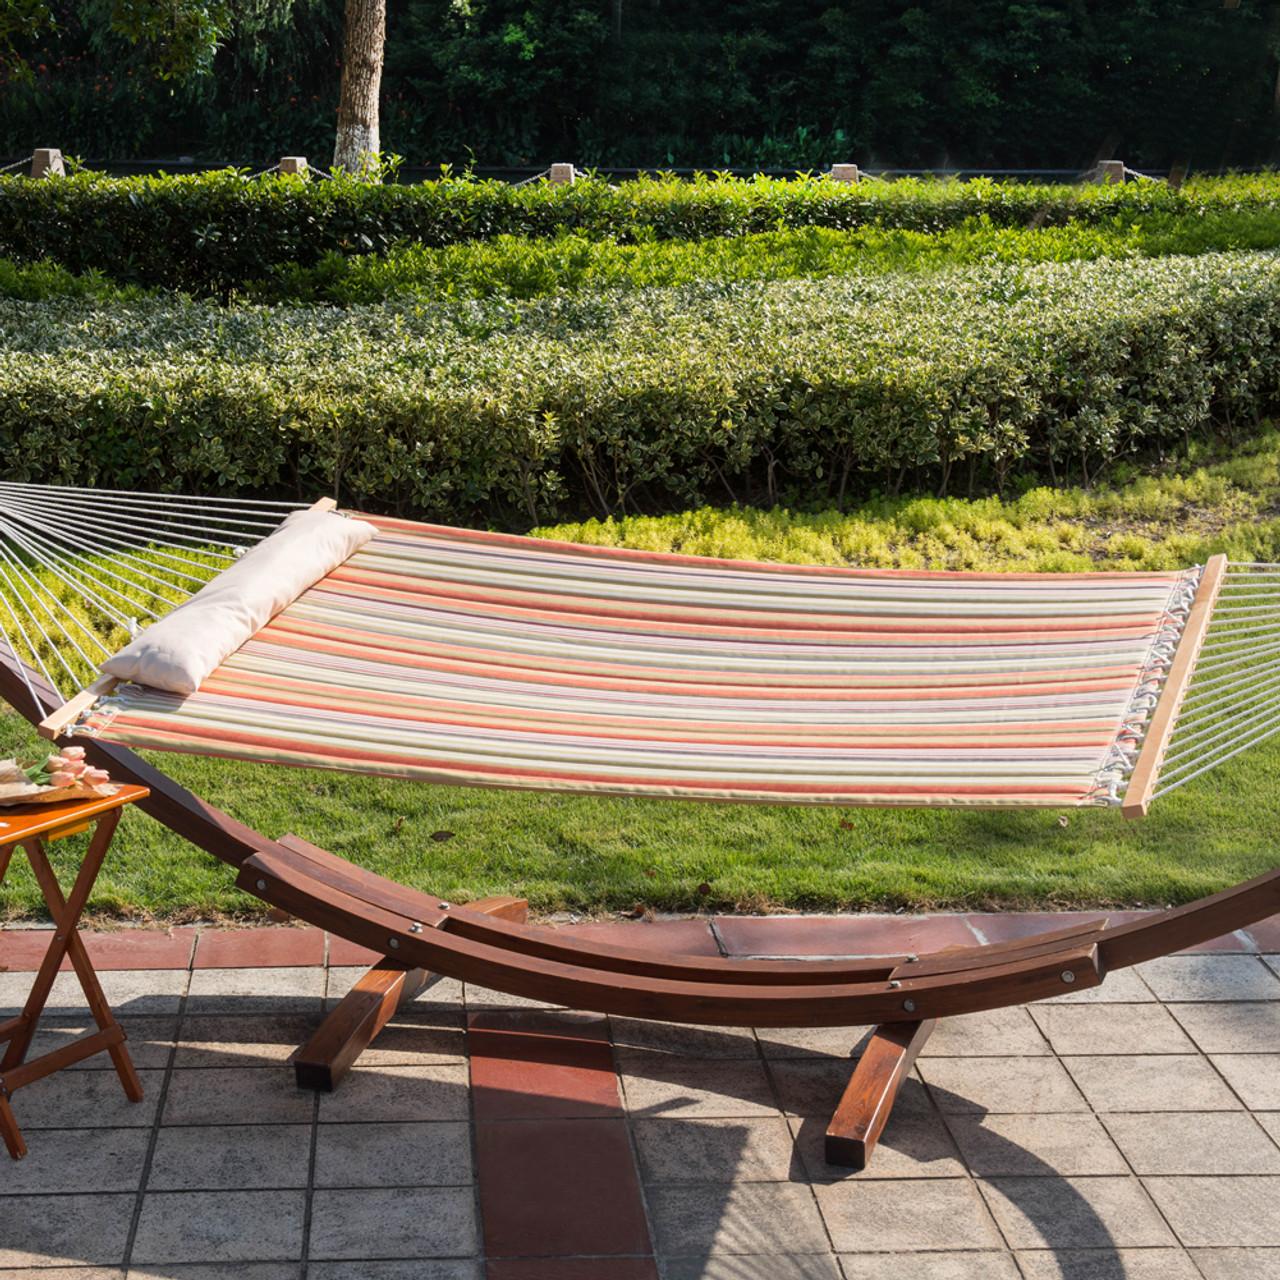 lazy daze hammocks quilted hammock double size spreader bar heavy duty stylish hammock swing with pillow lazydaze hammocks quilted fabric double size spreader bar heavy      rh   sundaleoutdoor